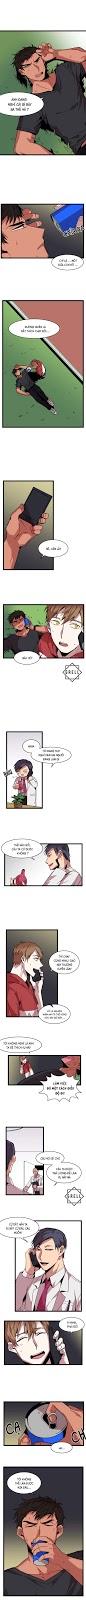 Trang 2 - [ Manhwa ] Trái tim thầm lặng - Heart Silent - Chap 008 (- Han Kyeul) - Truyện tranh Gay - Server HostedOnGoogleServerStaging